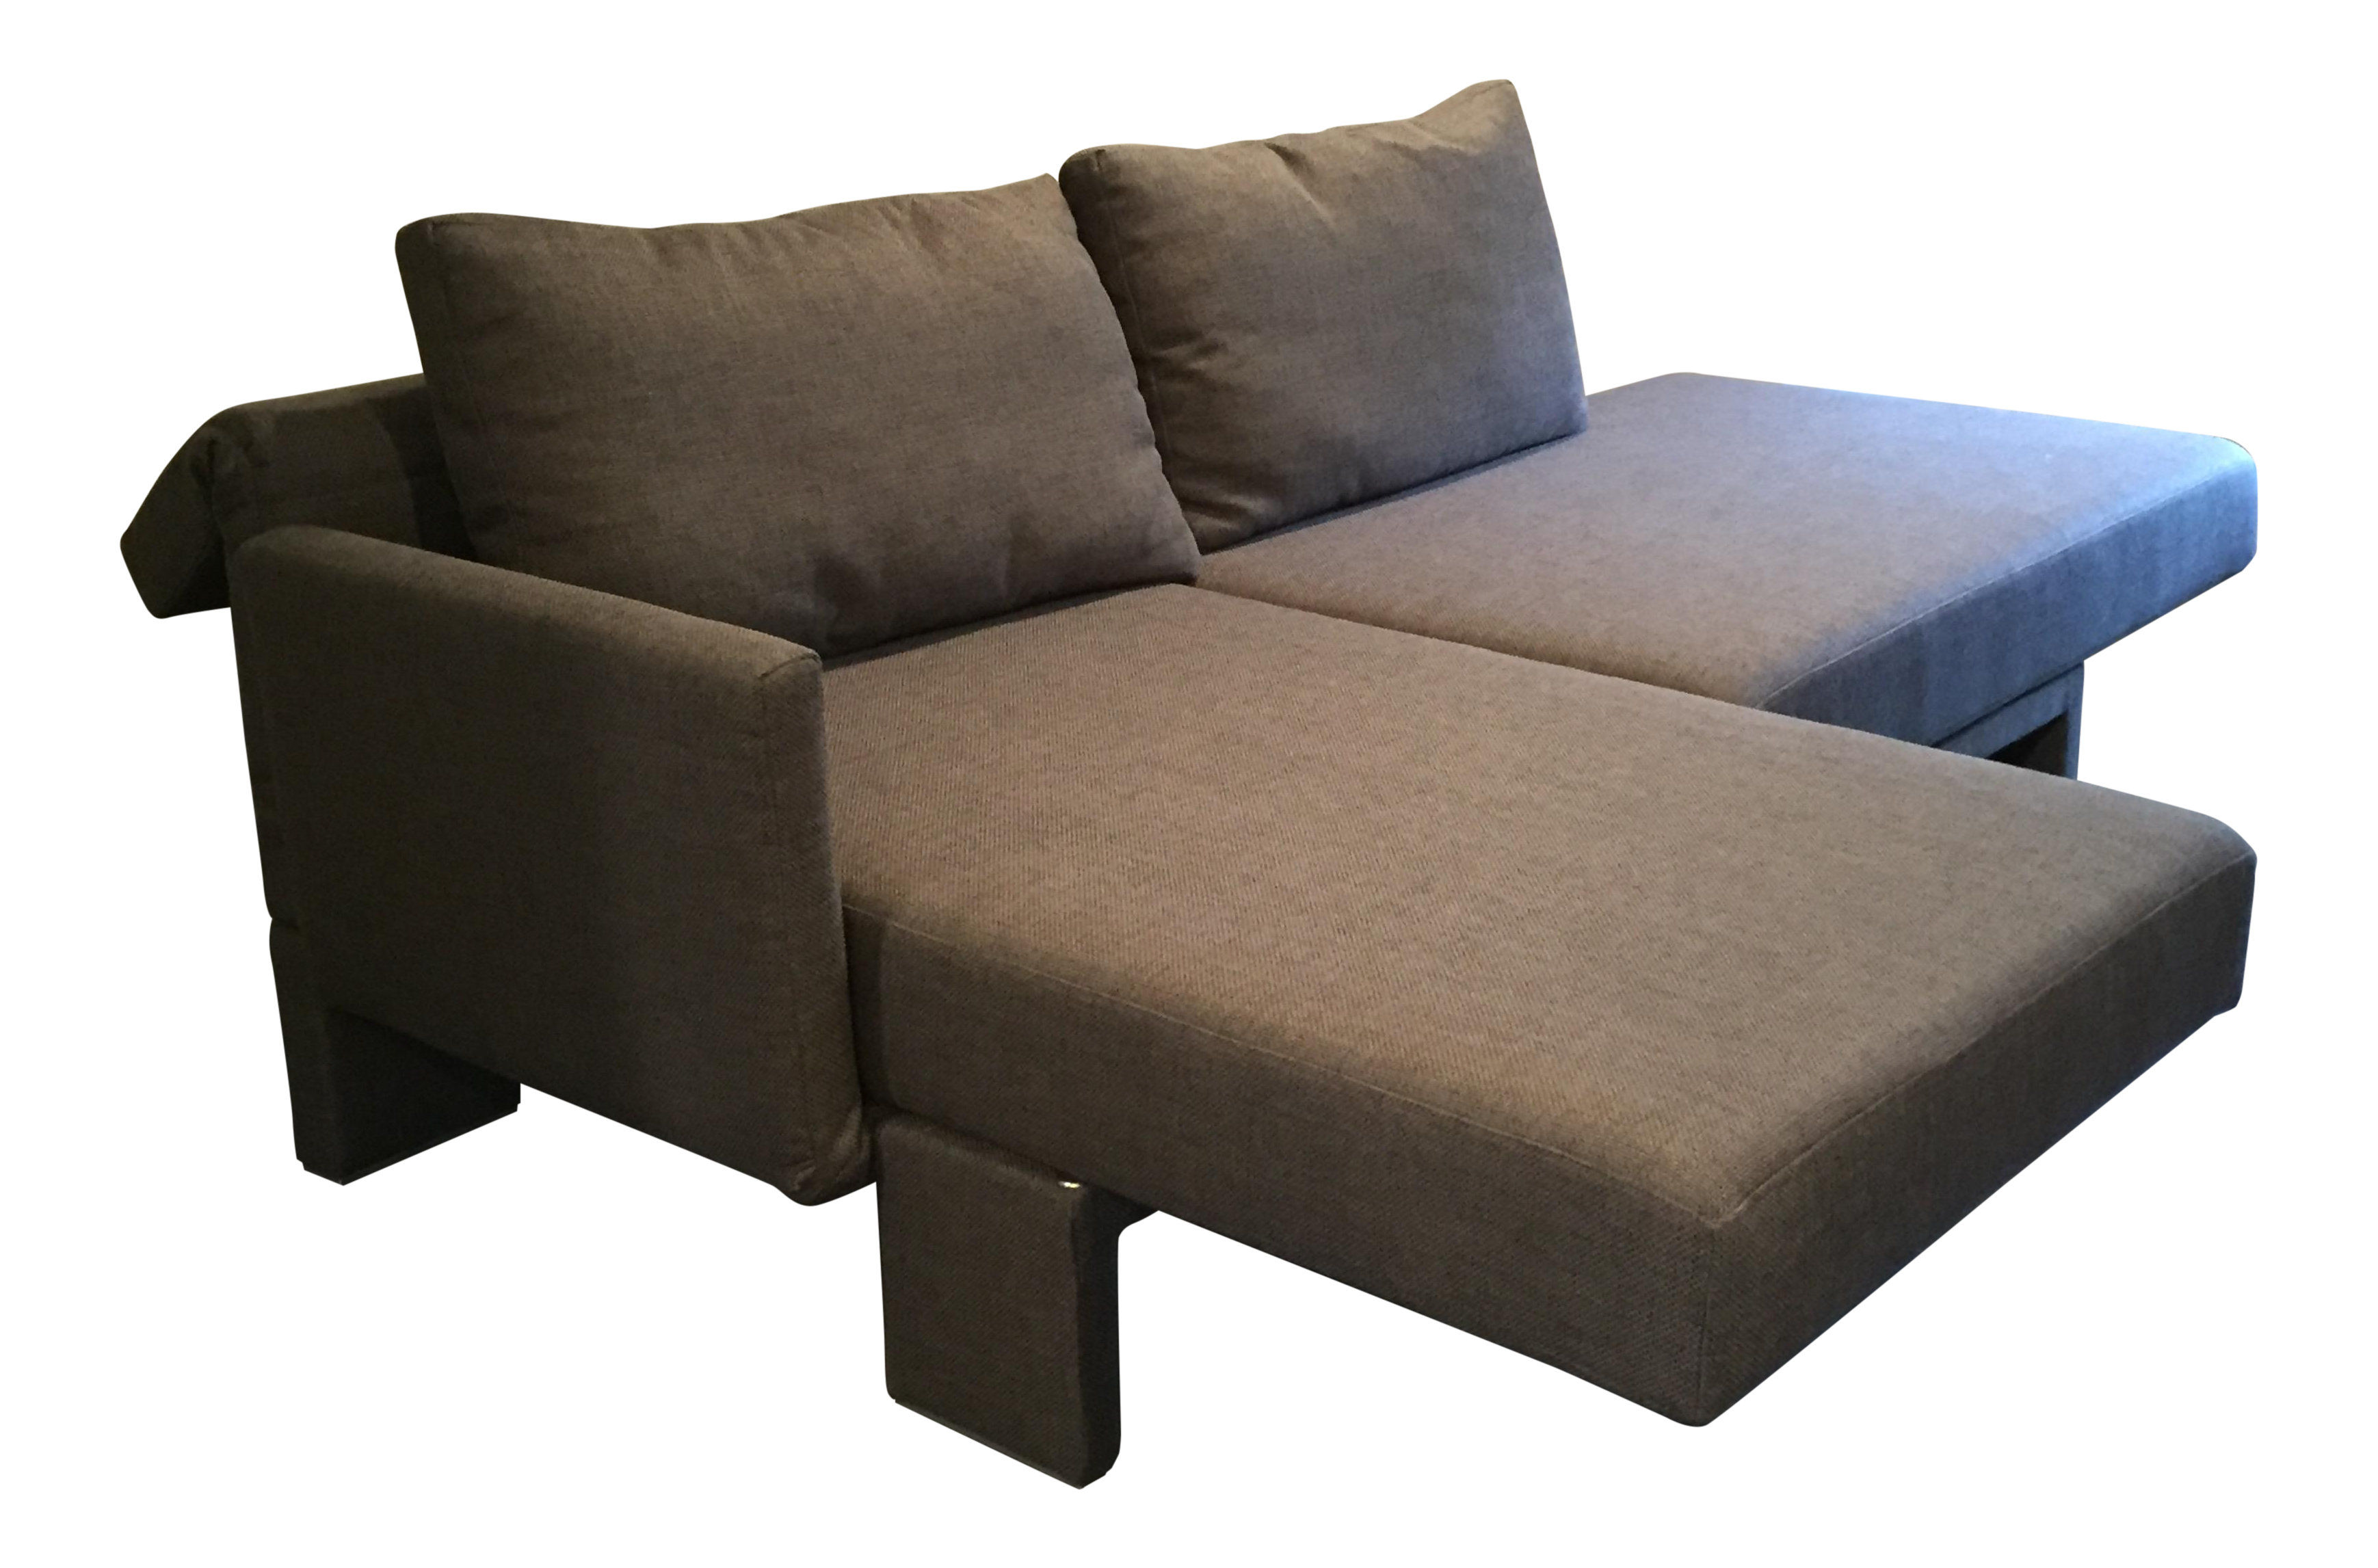 franz fertig sectional sofa chairish. Black Bedroom Furniture Sets. Home Design Ideas